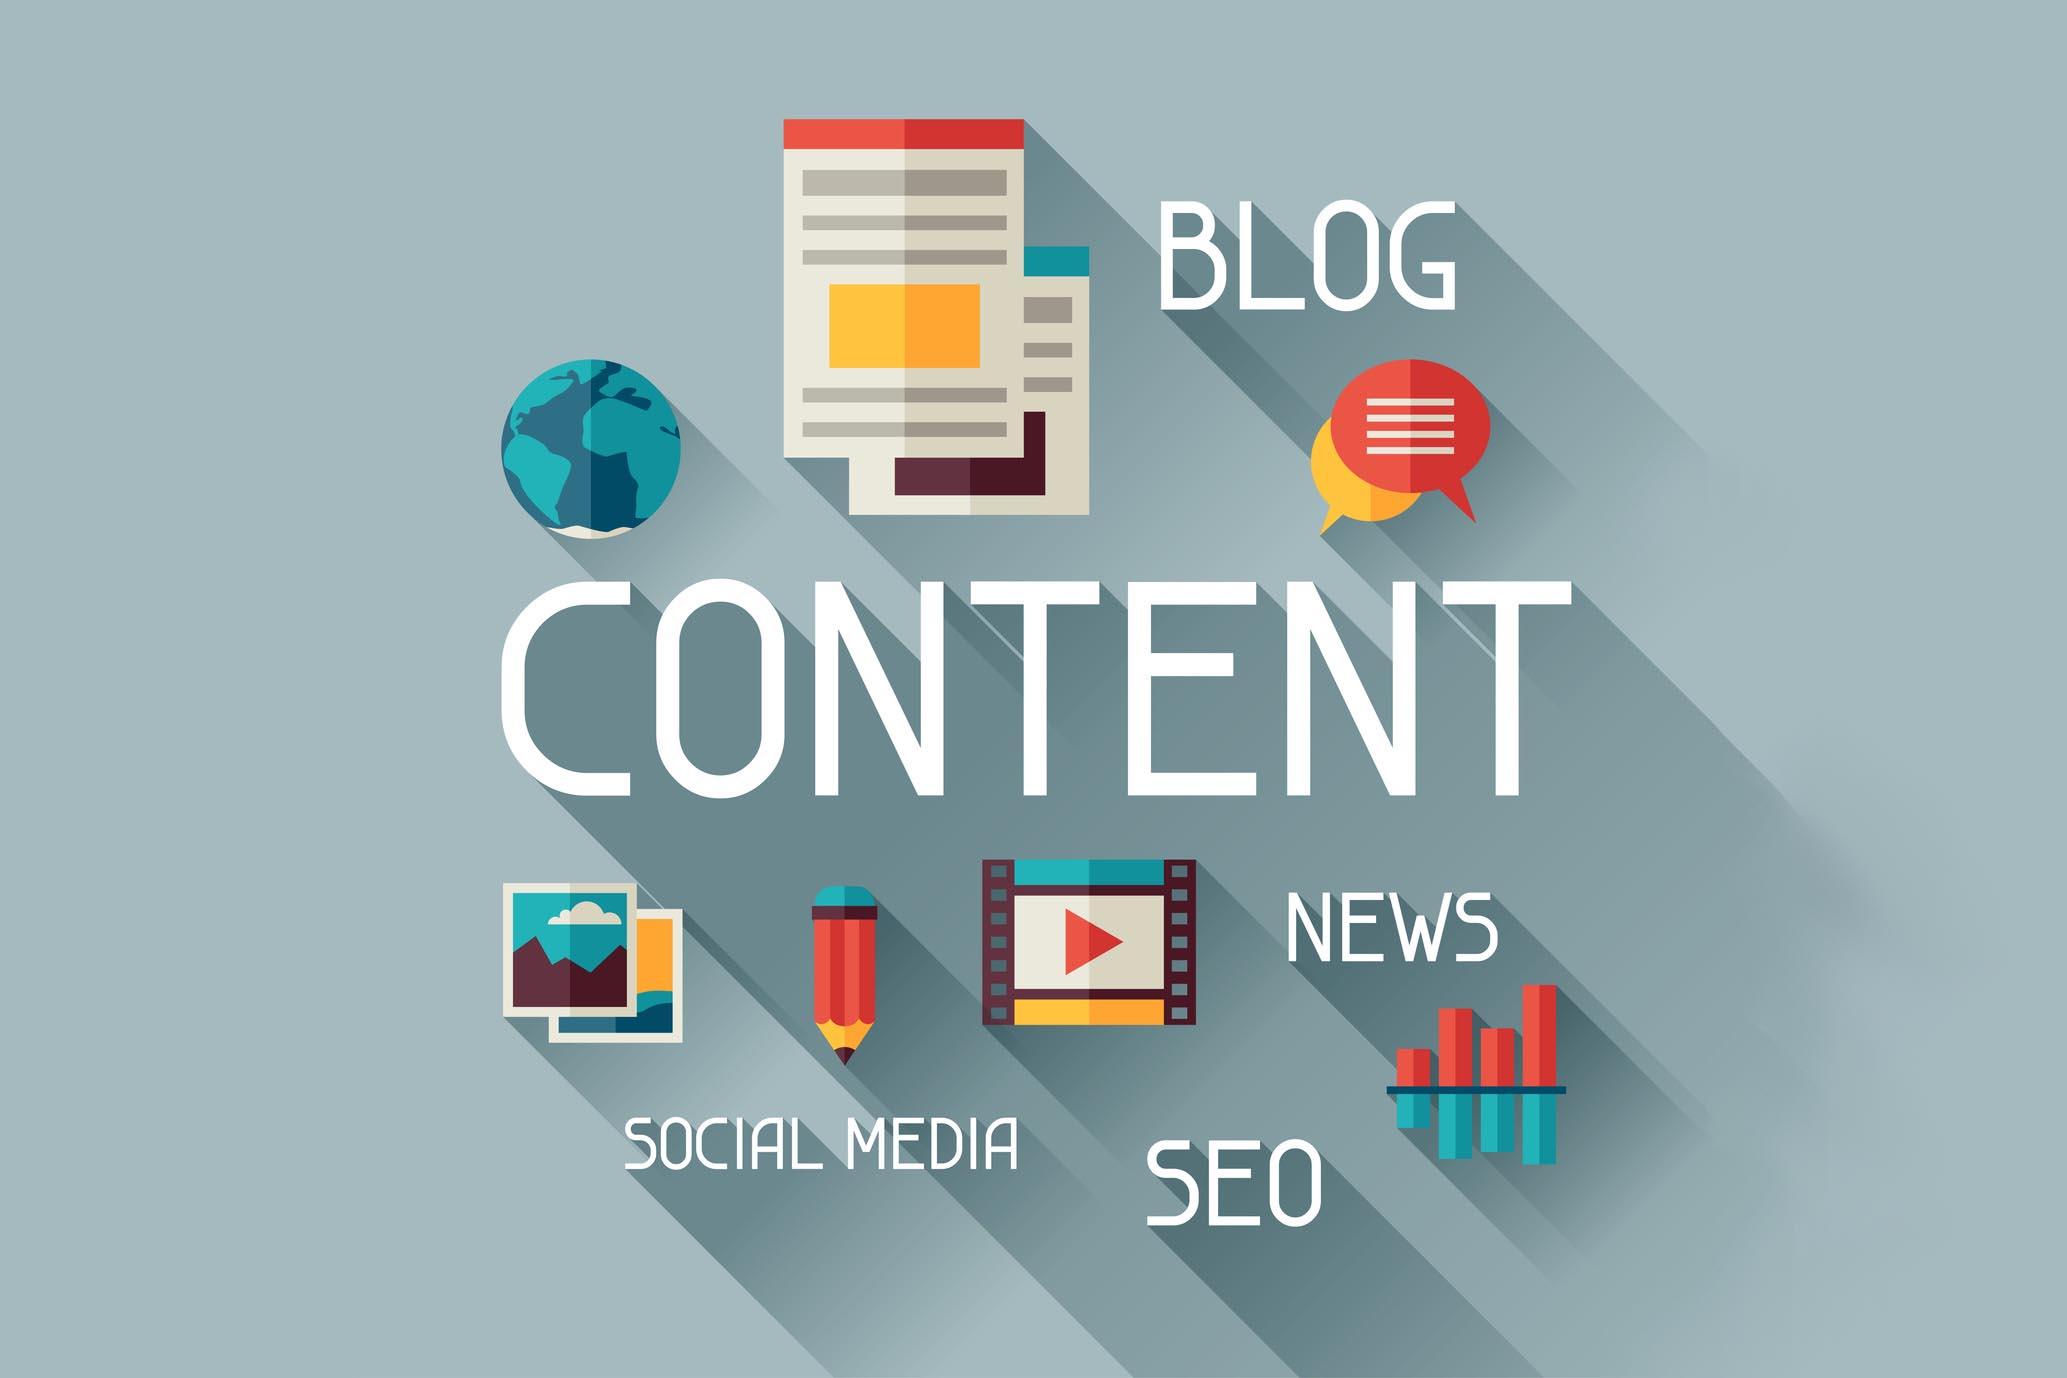 Apaerçu du marketing de contenu